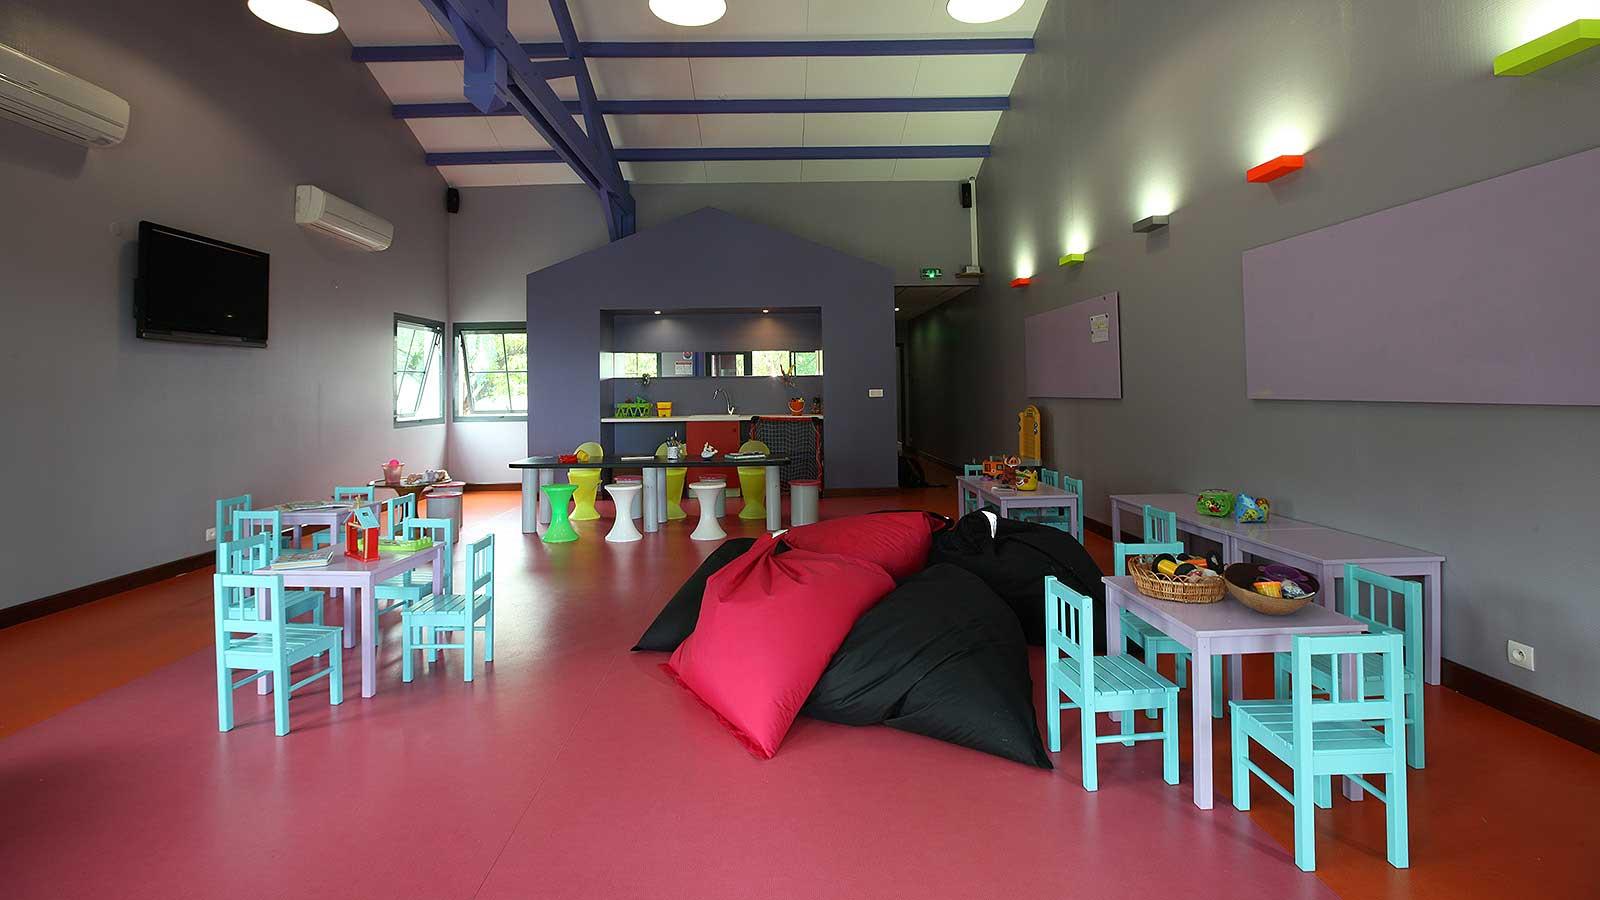 http://www.deshotelsetdesiles.com/hotel-vol-guadeloupe/photos/diapo-creole-club-enfant.jpg